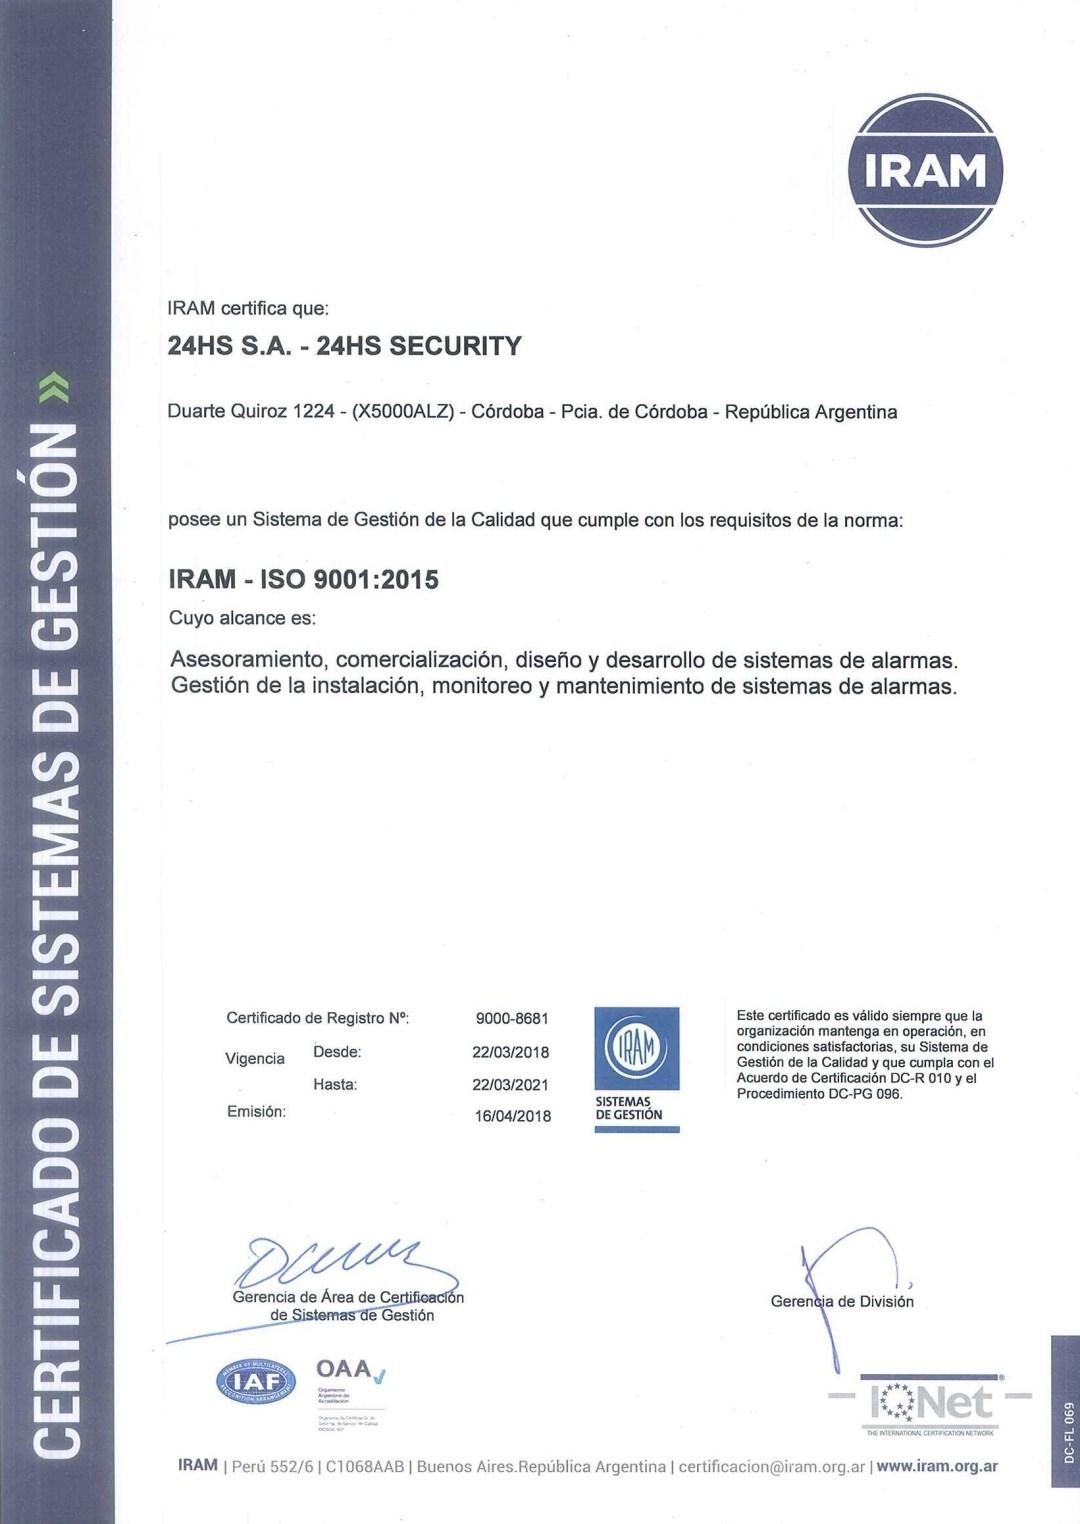 Certificado ISO9001:2015 IRAM